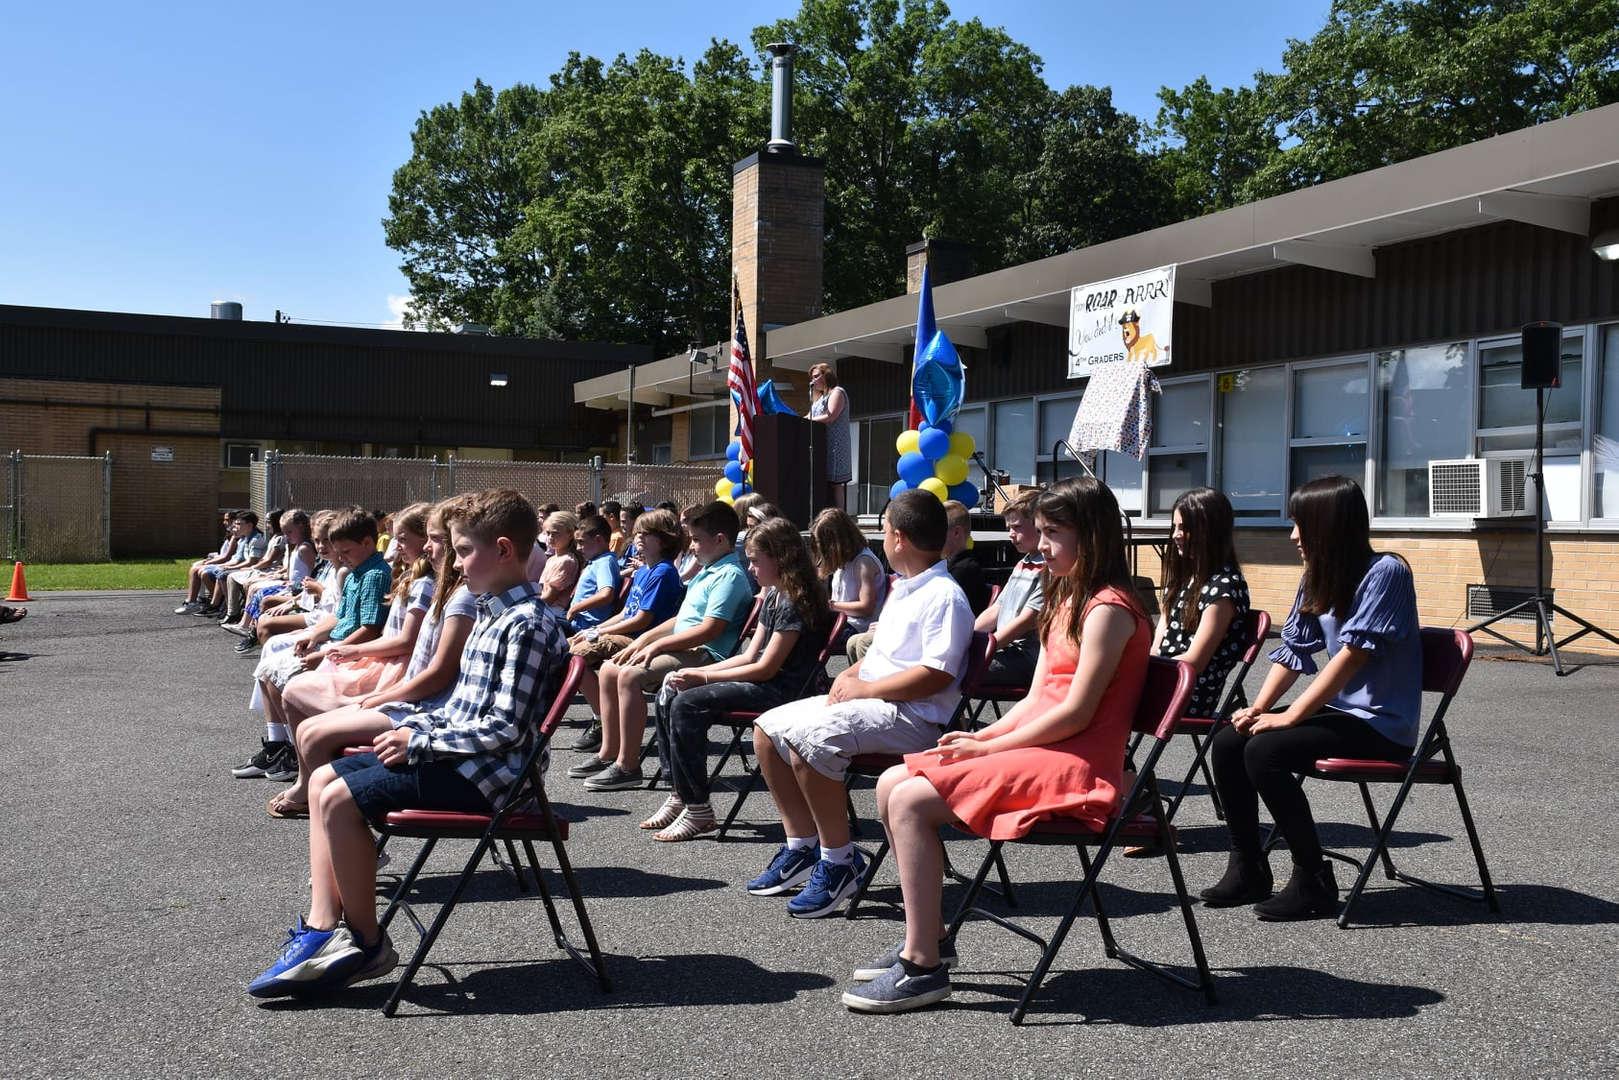 LA Grade 4 Promotion Ceremony held 6/15/21